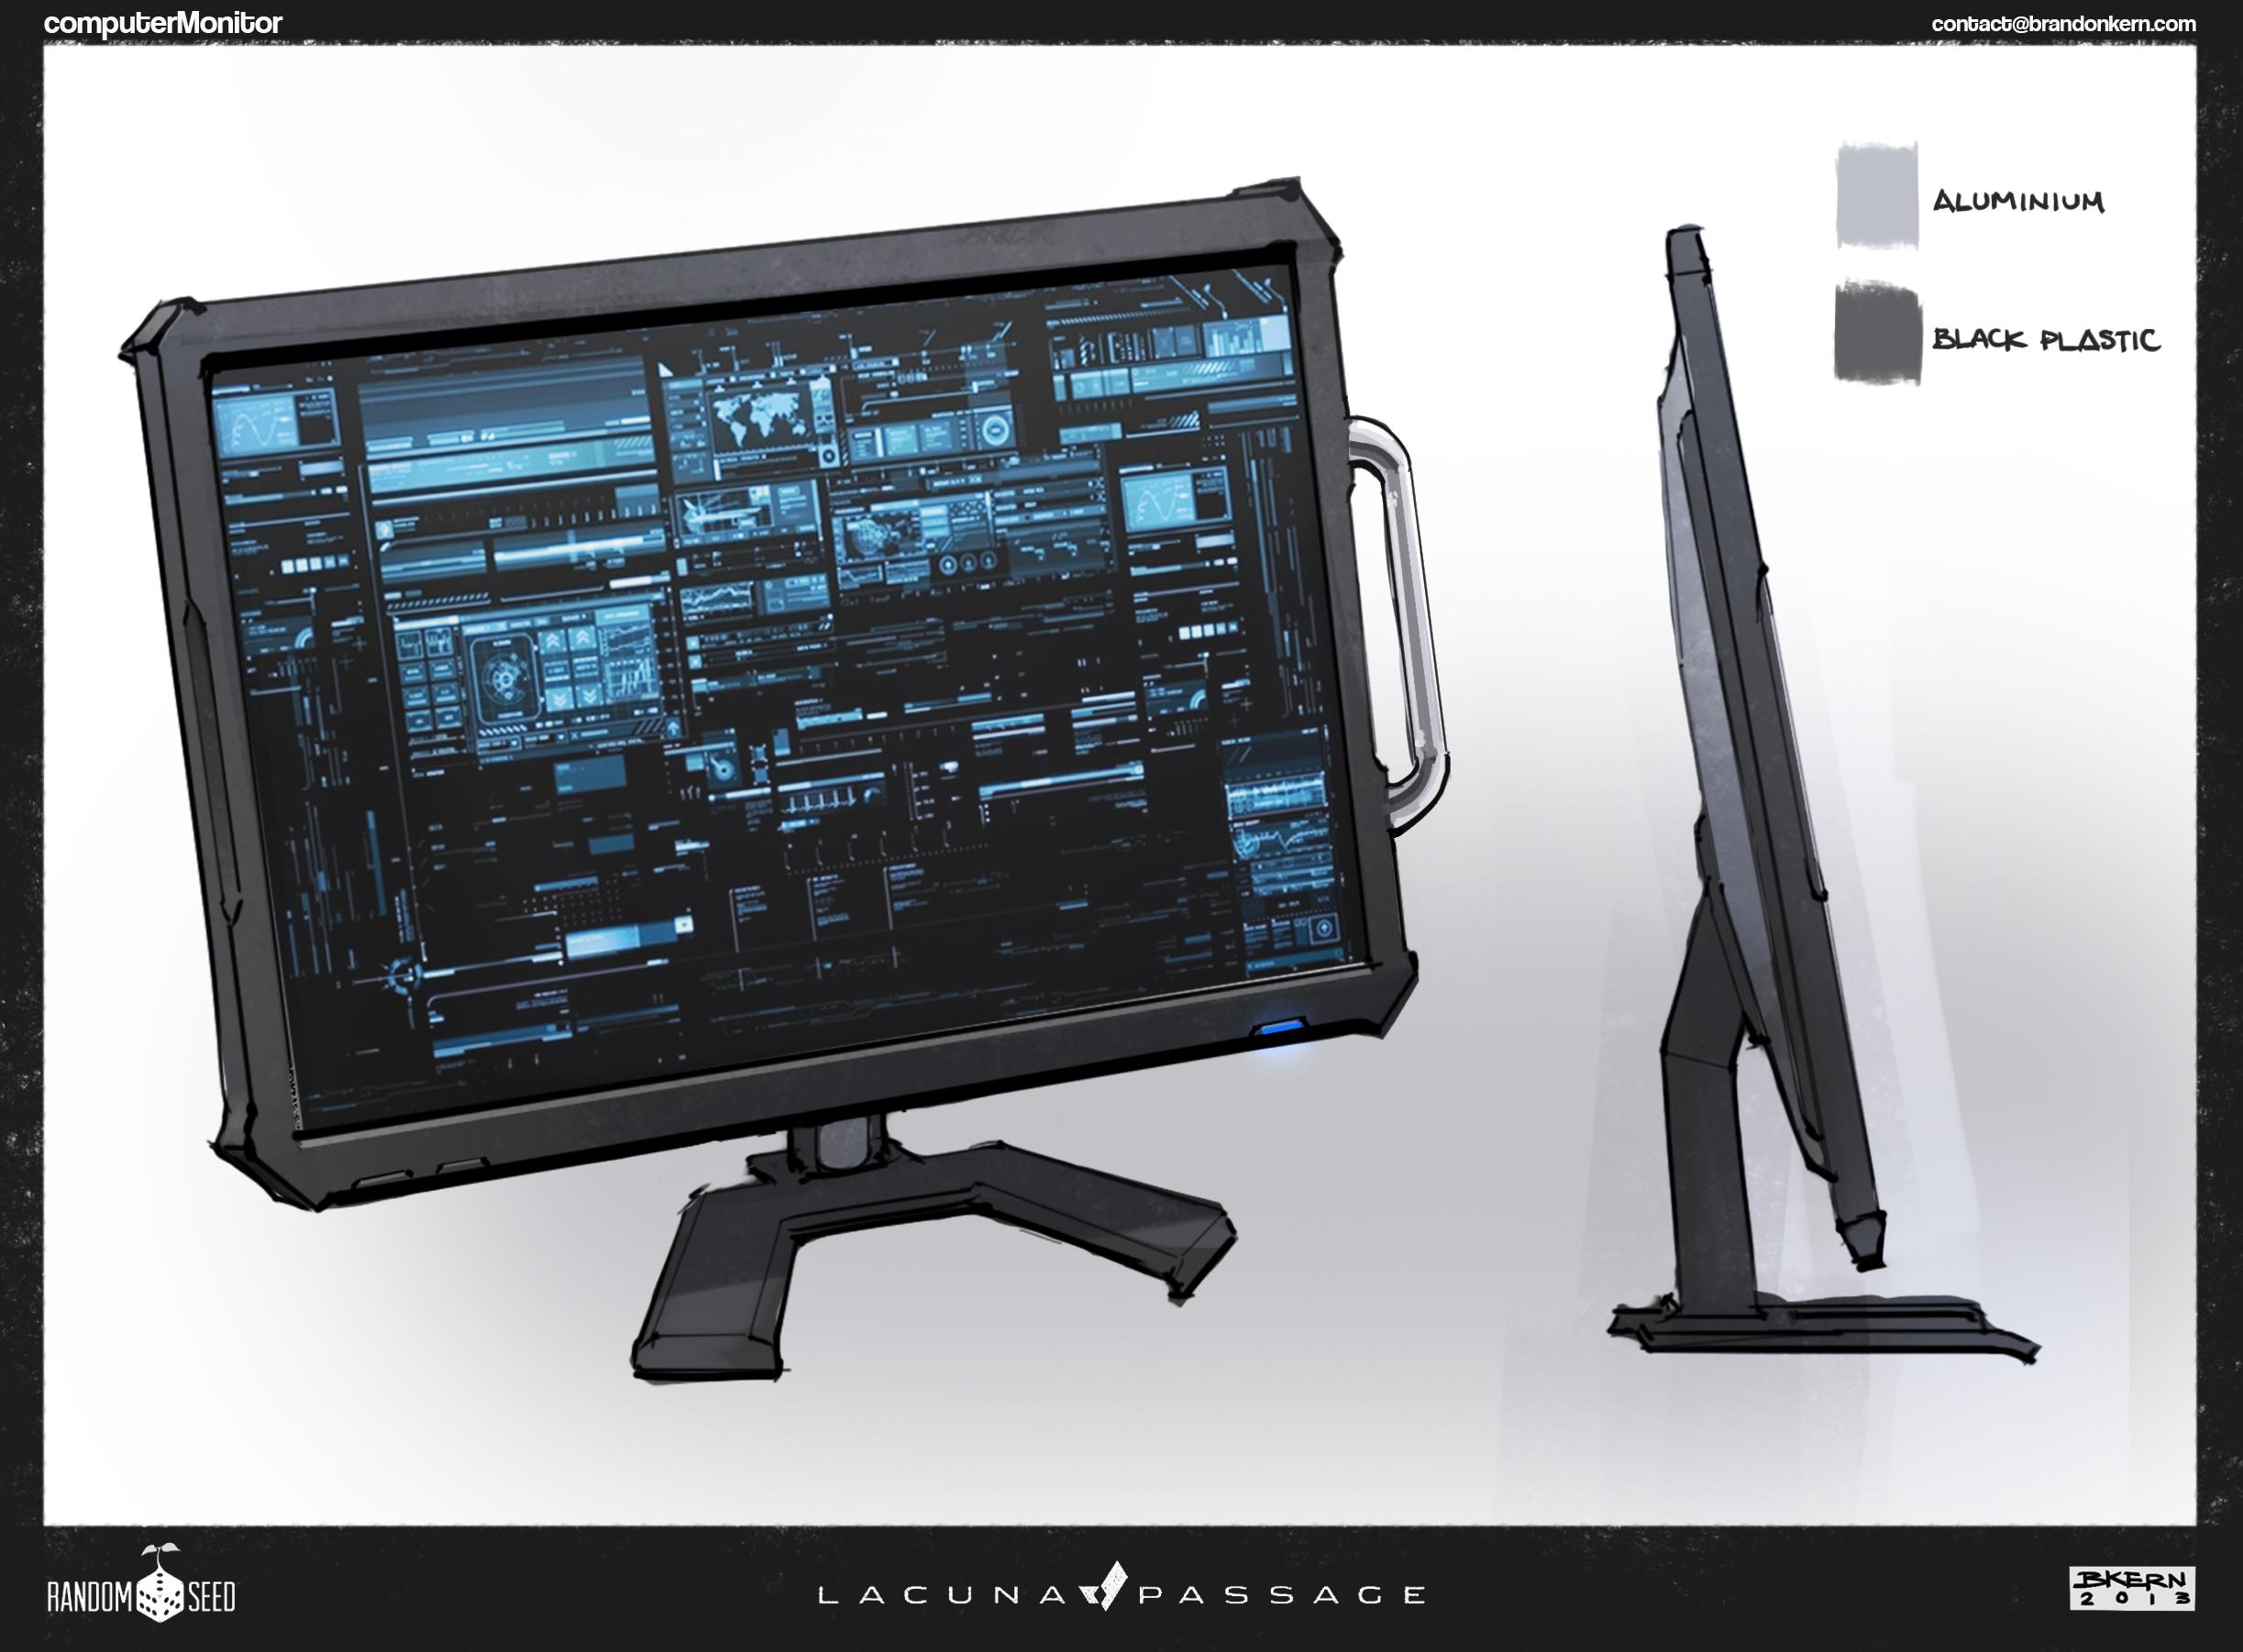 computerMonitor.jpg